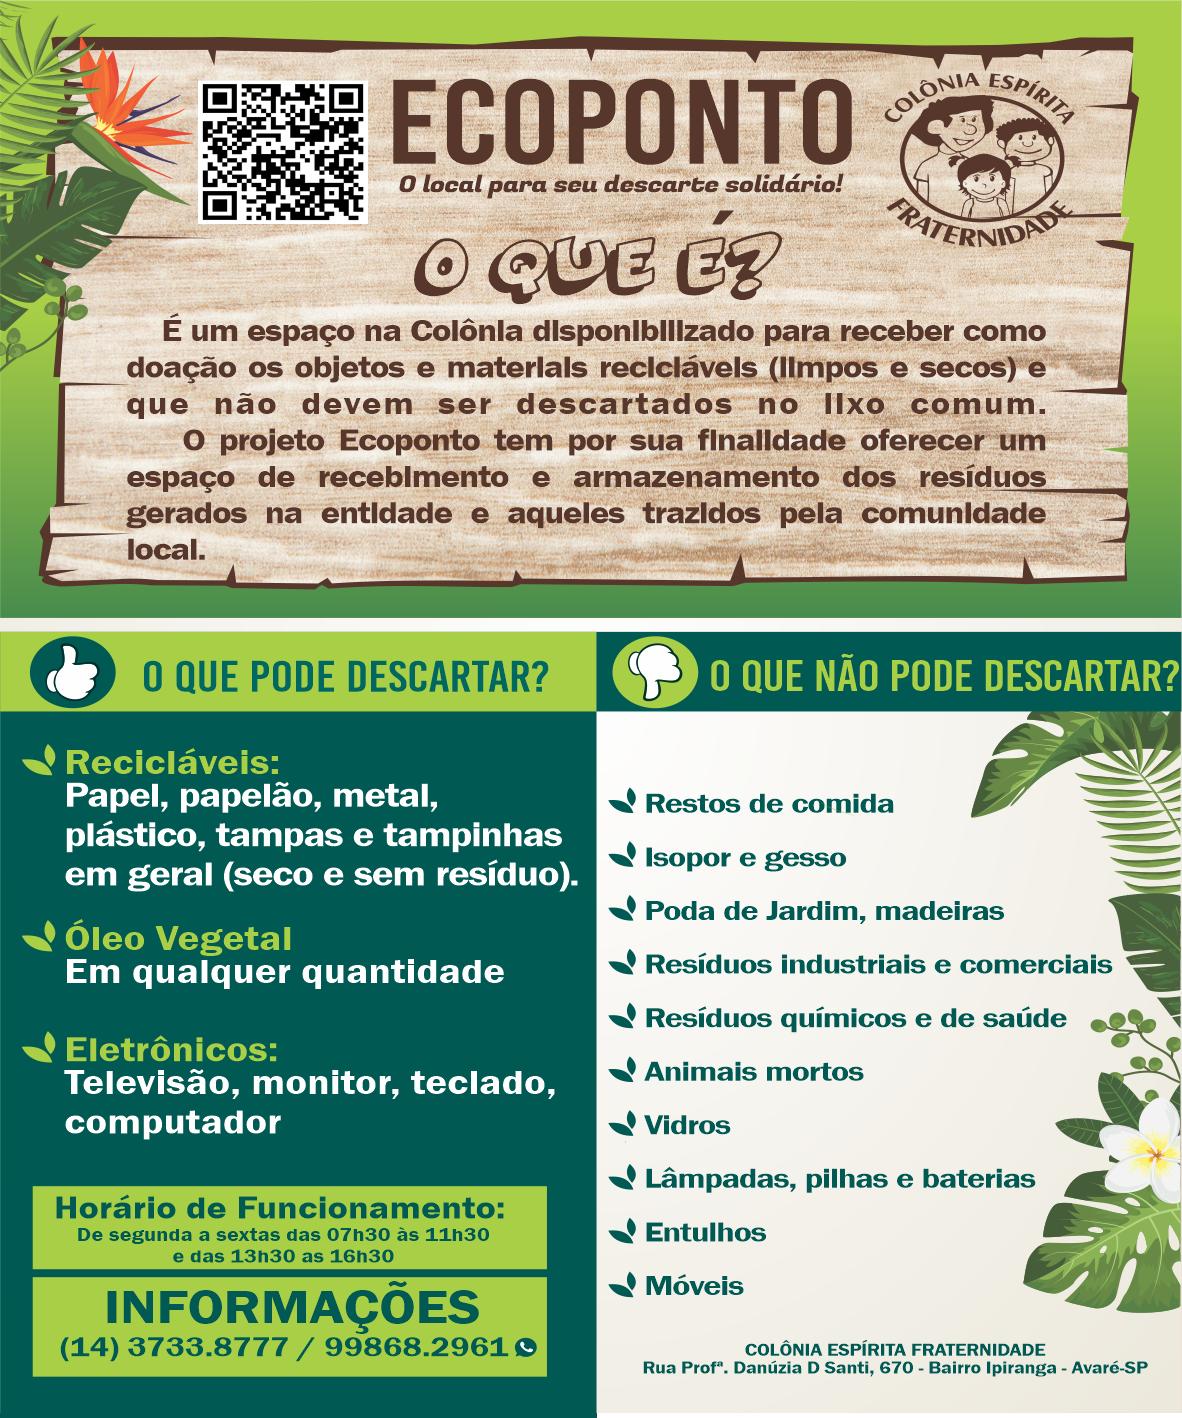 Ecoponto